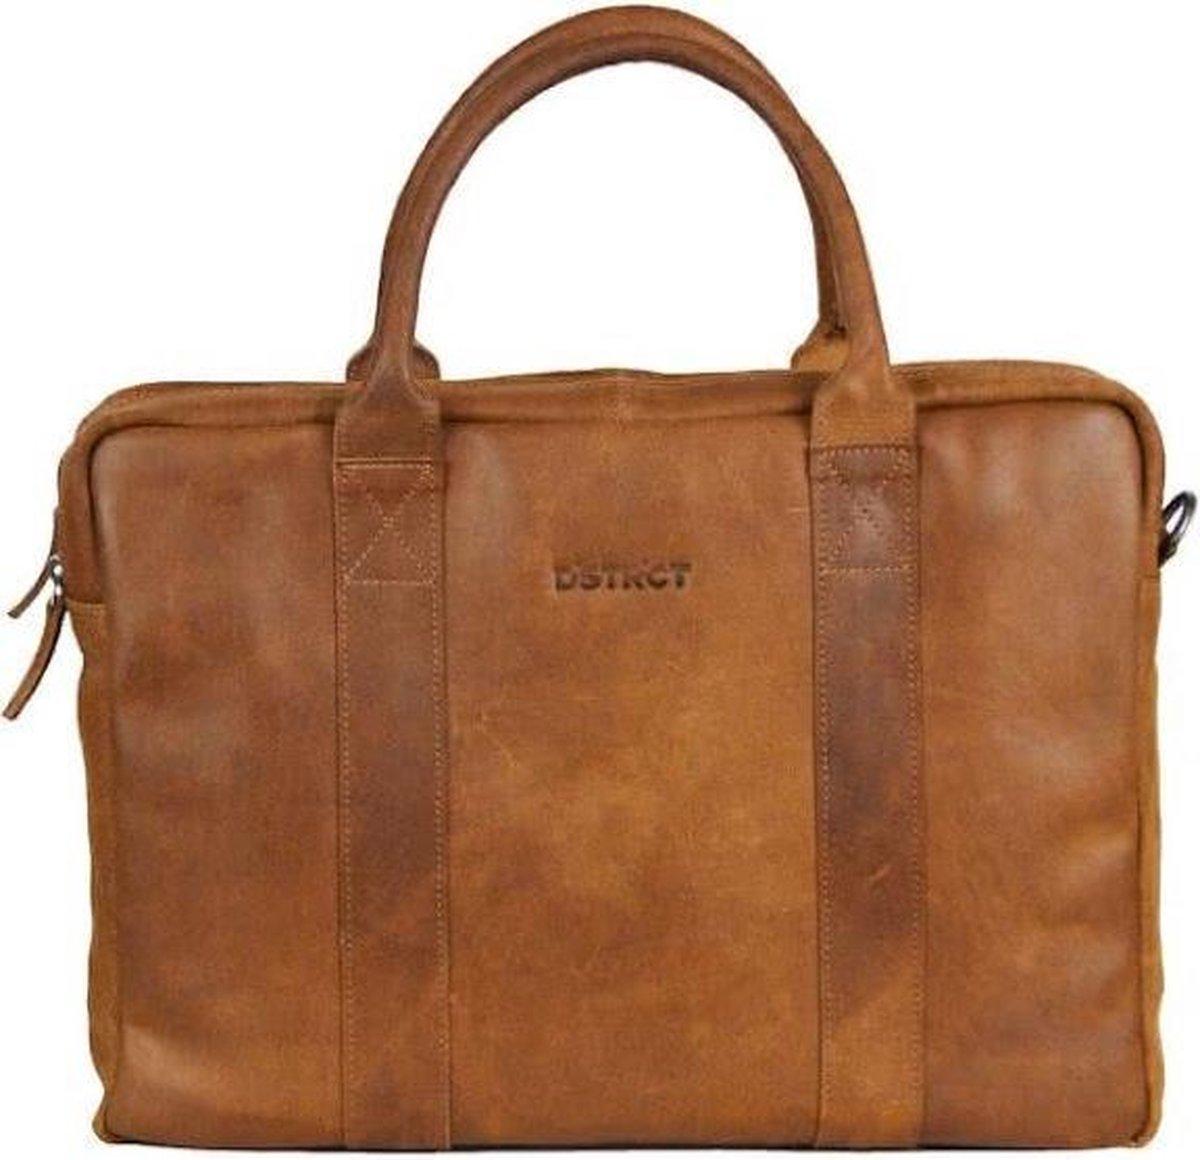 DSTRCT Limited Leren Business Laptoptas - 15,6 inch laptopvak met rits - Sleutelhanger - Cognac